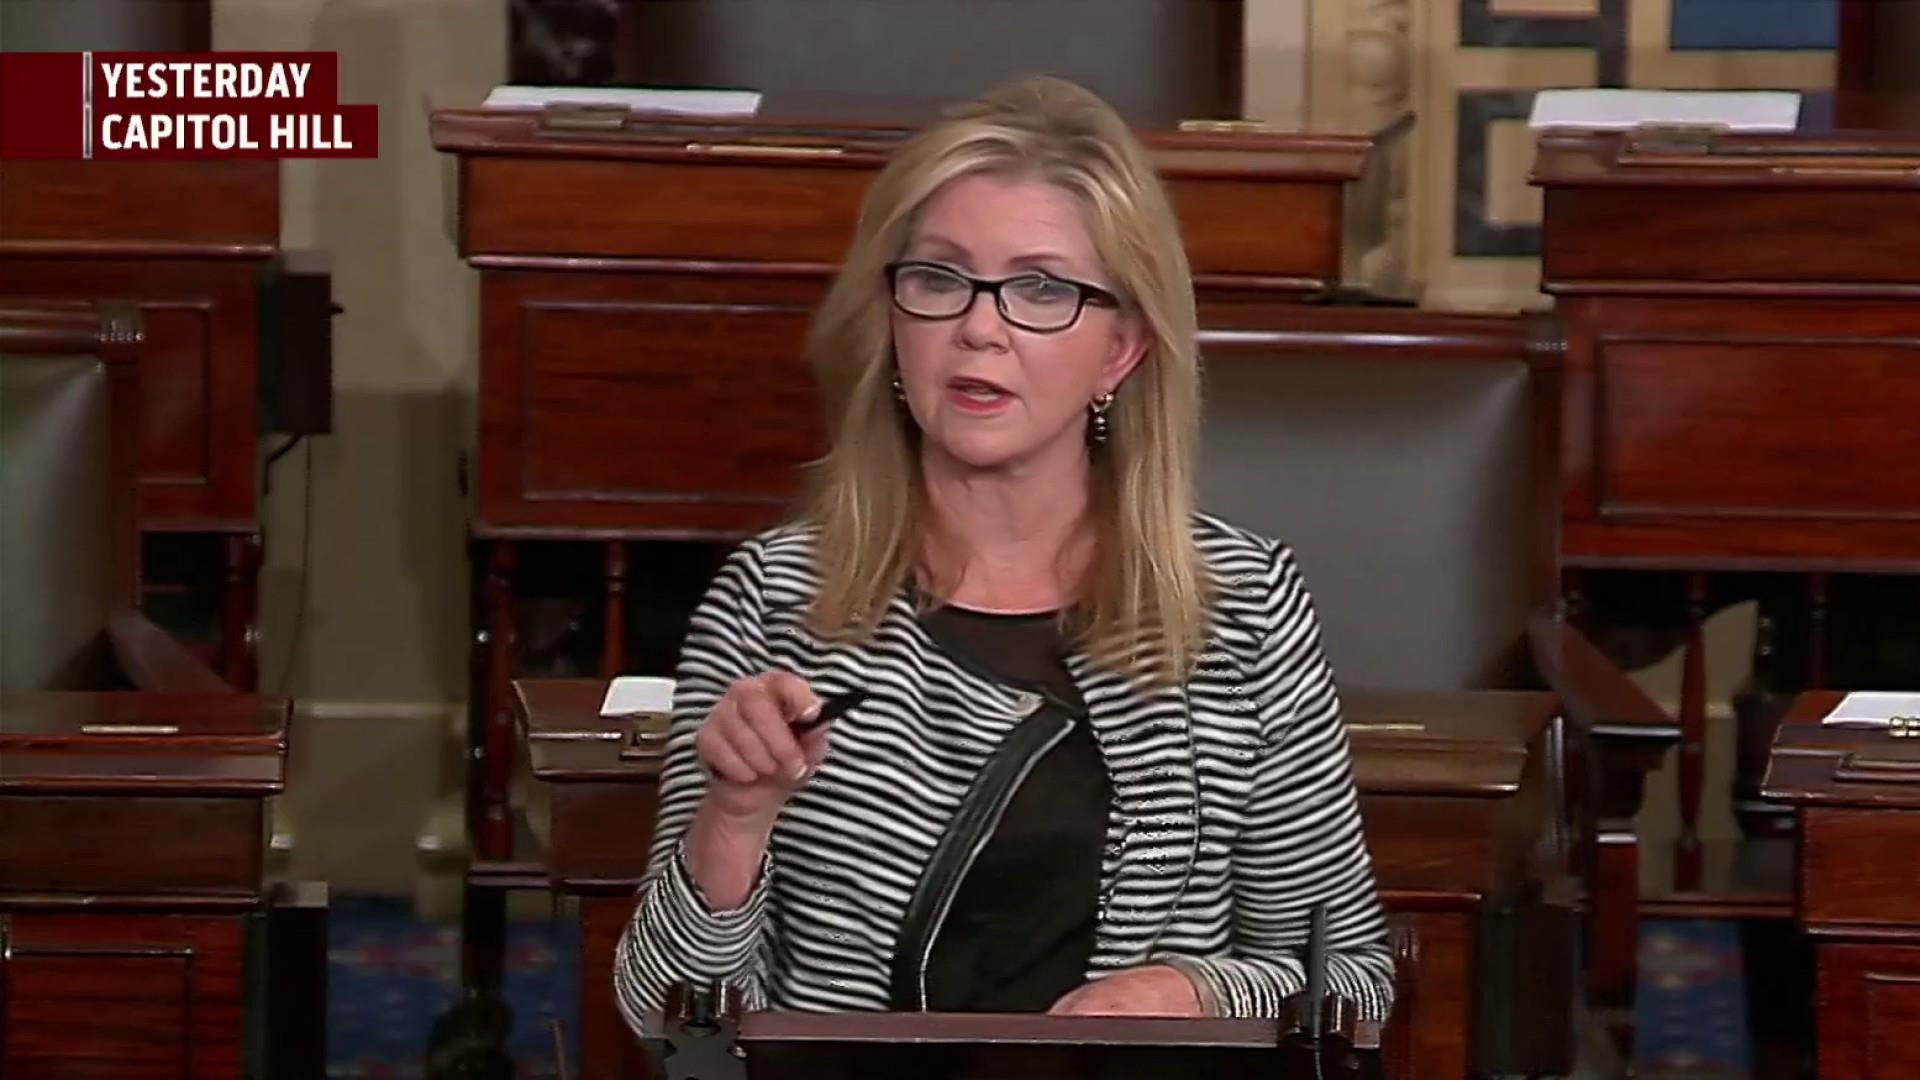 Joe: Let it sink in that GOP opposed interference bill